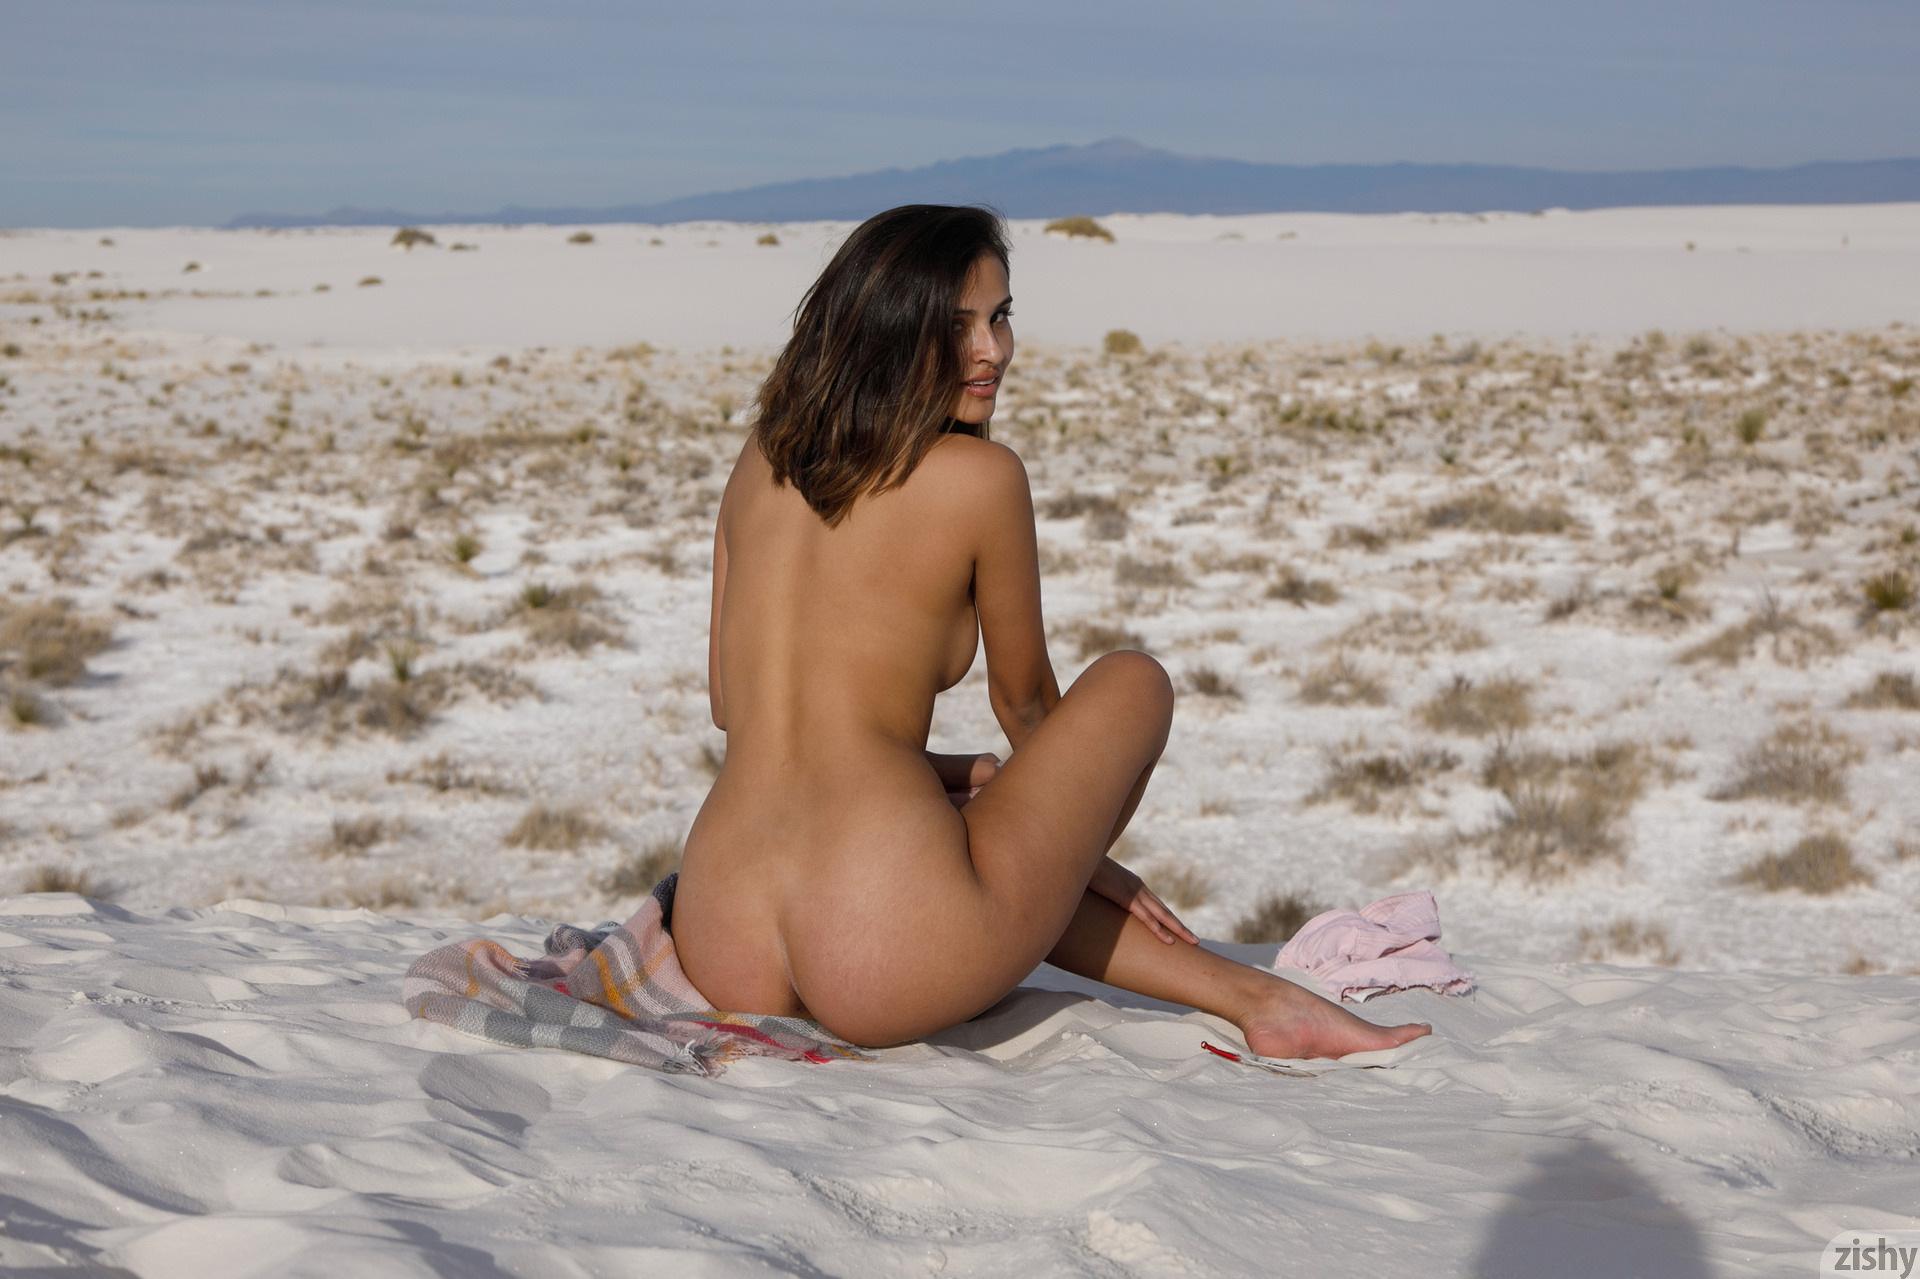 Alejandra Cobos White Sands 3 Zishy (21)